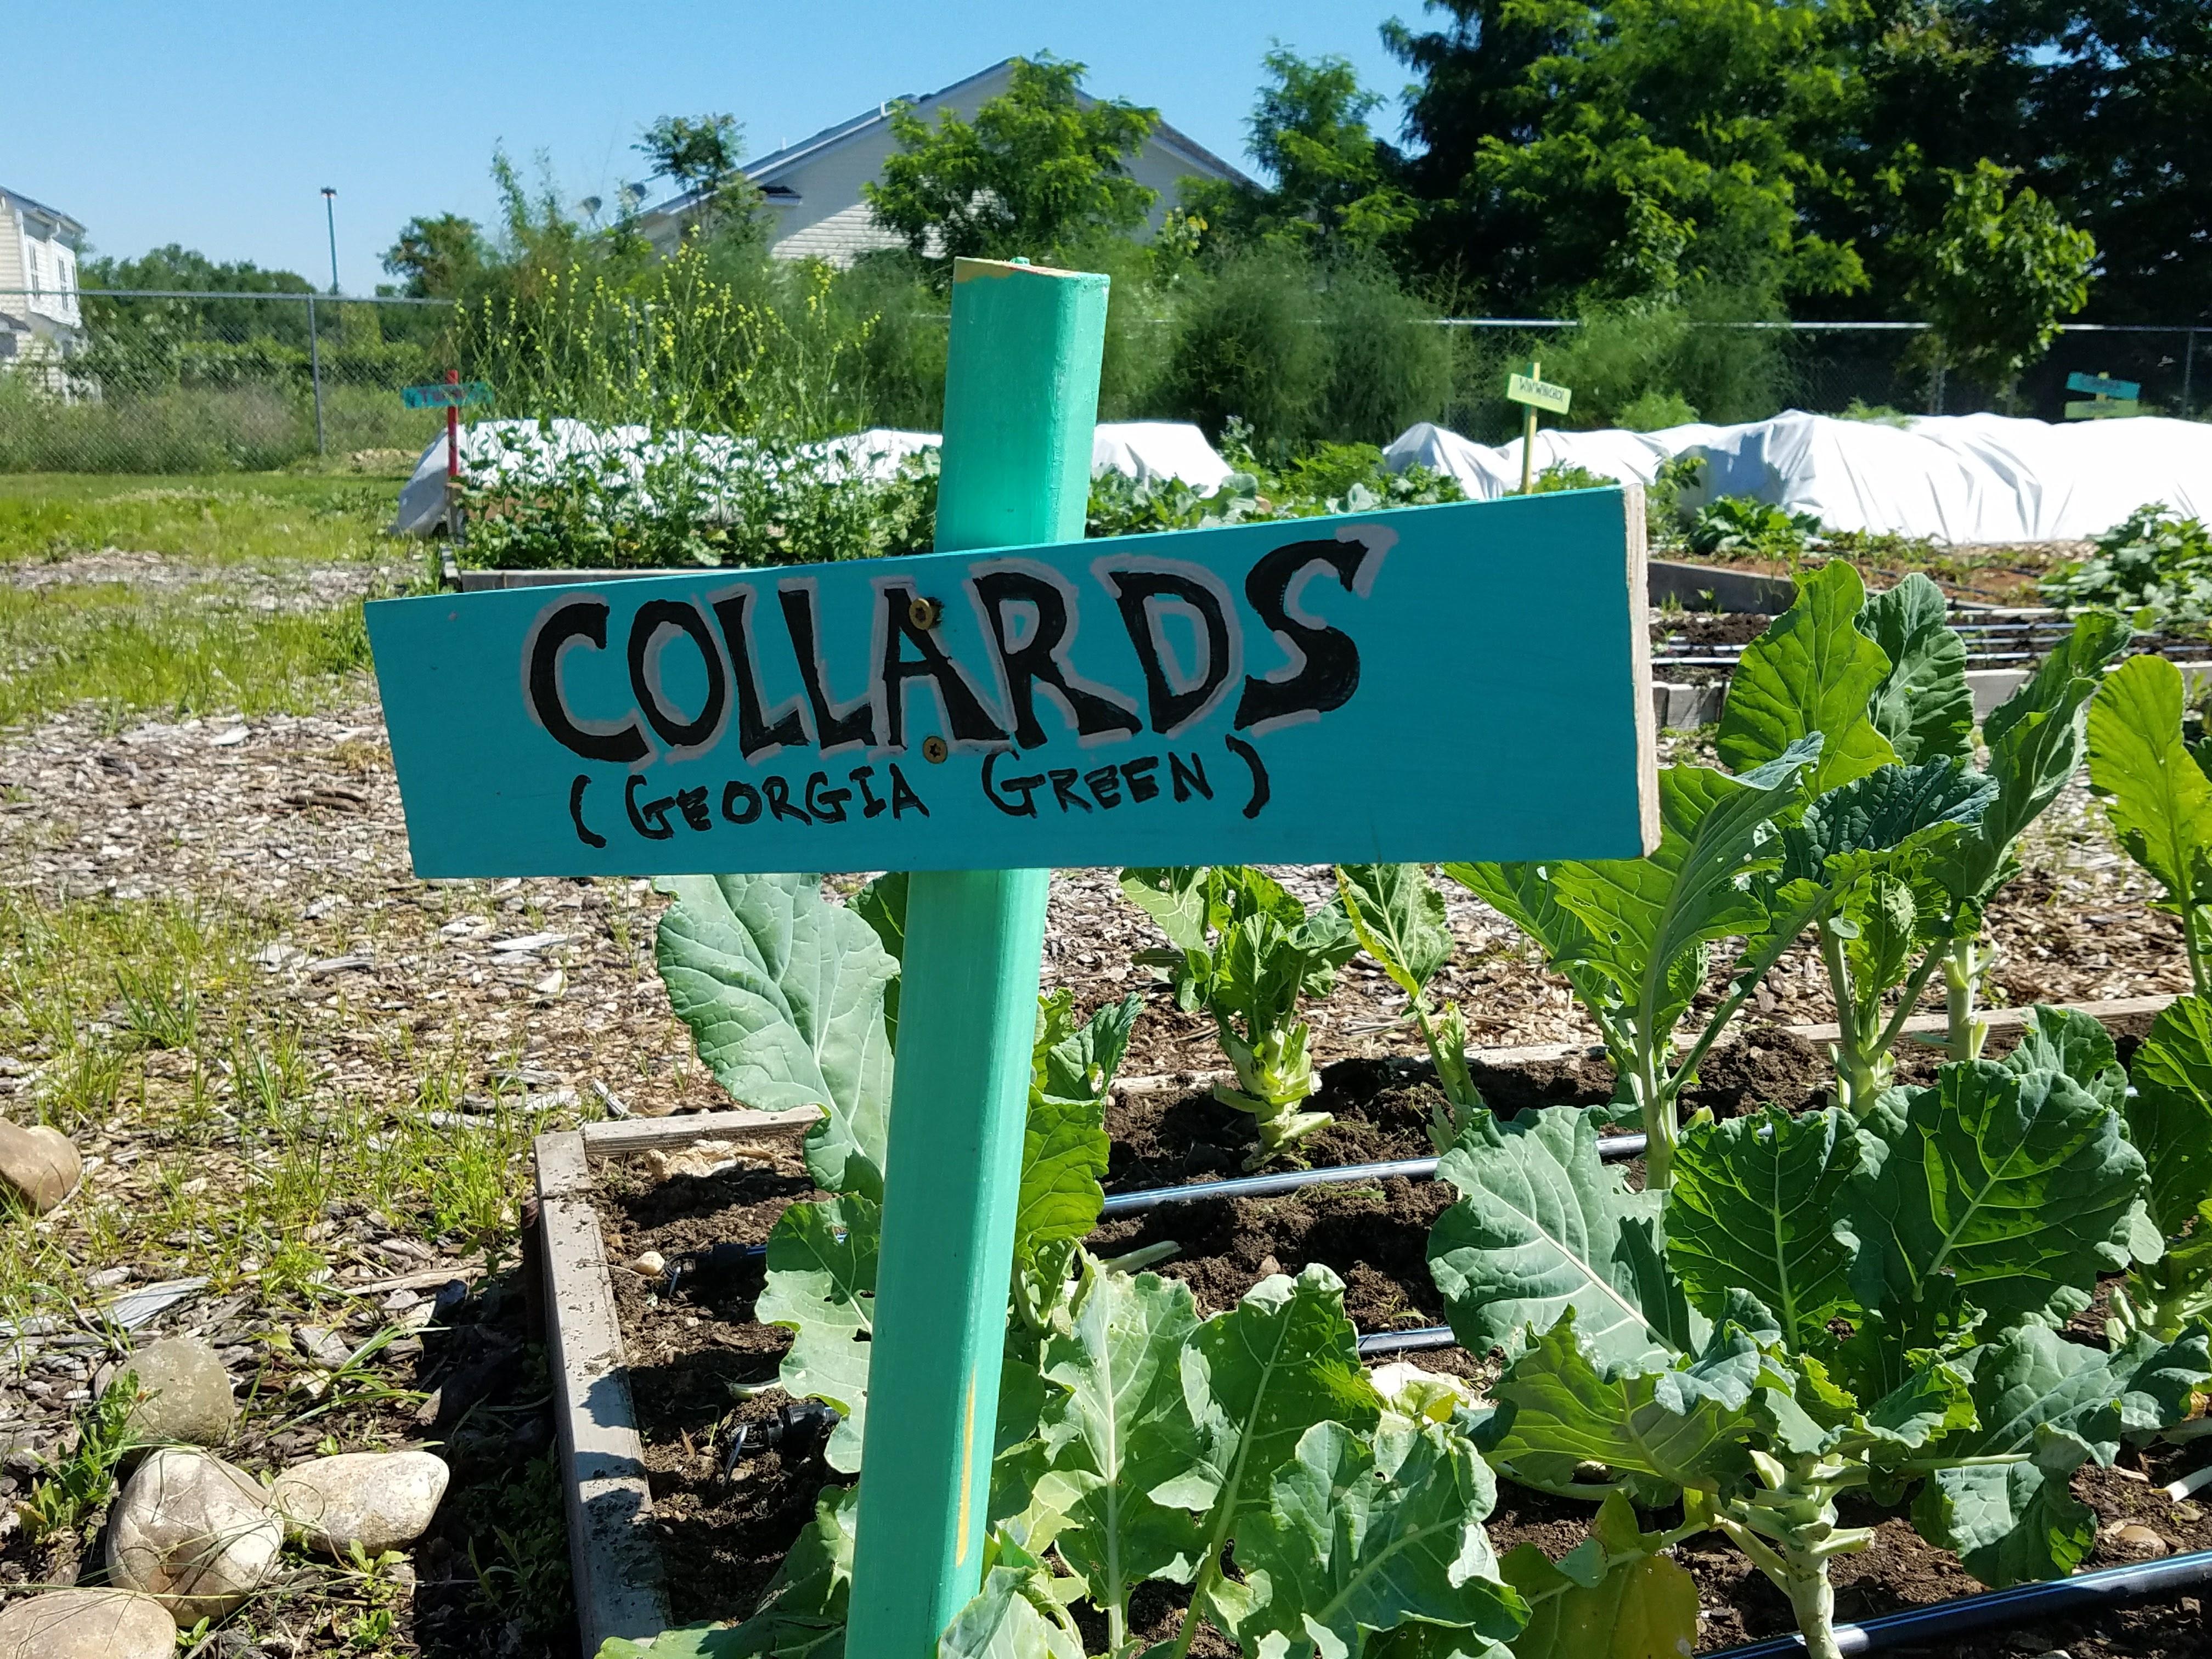 CAFB grows organic produce like Georgia Green Collards in its Urban Demonstration Garden.